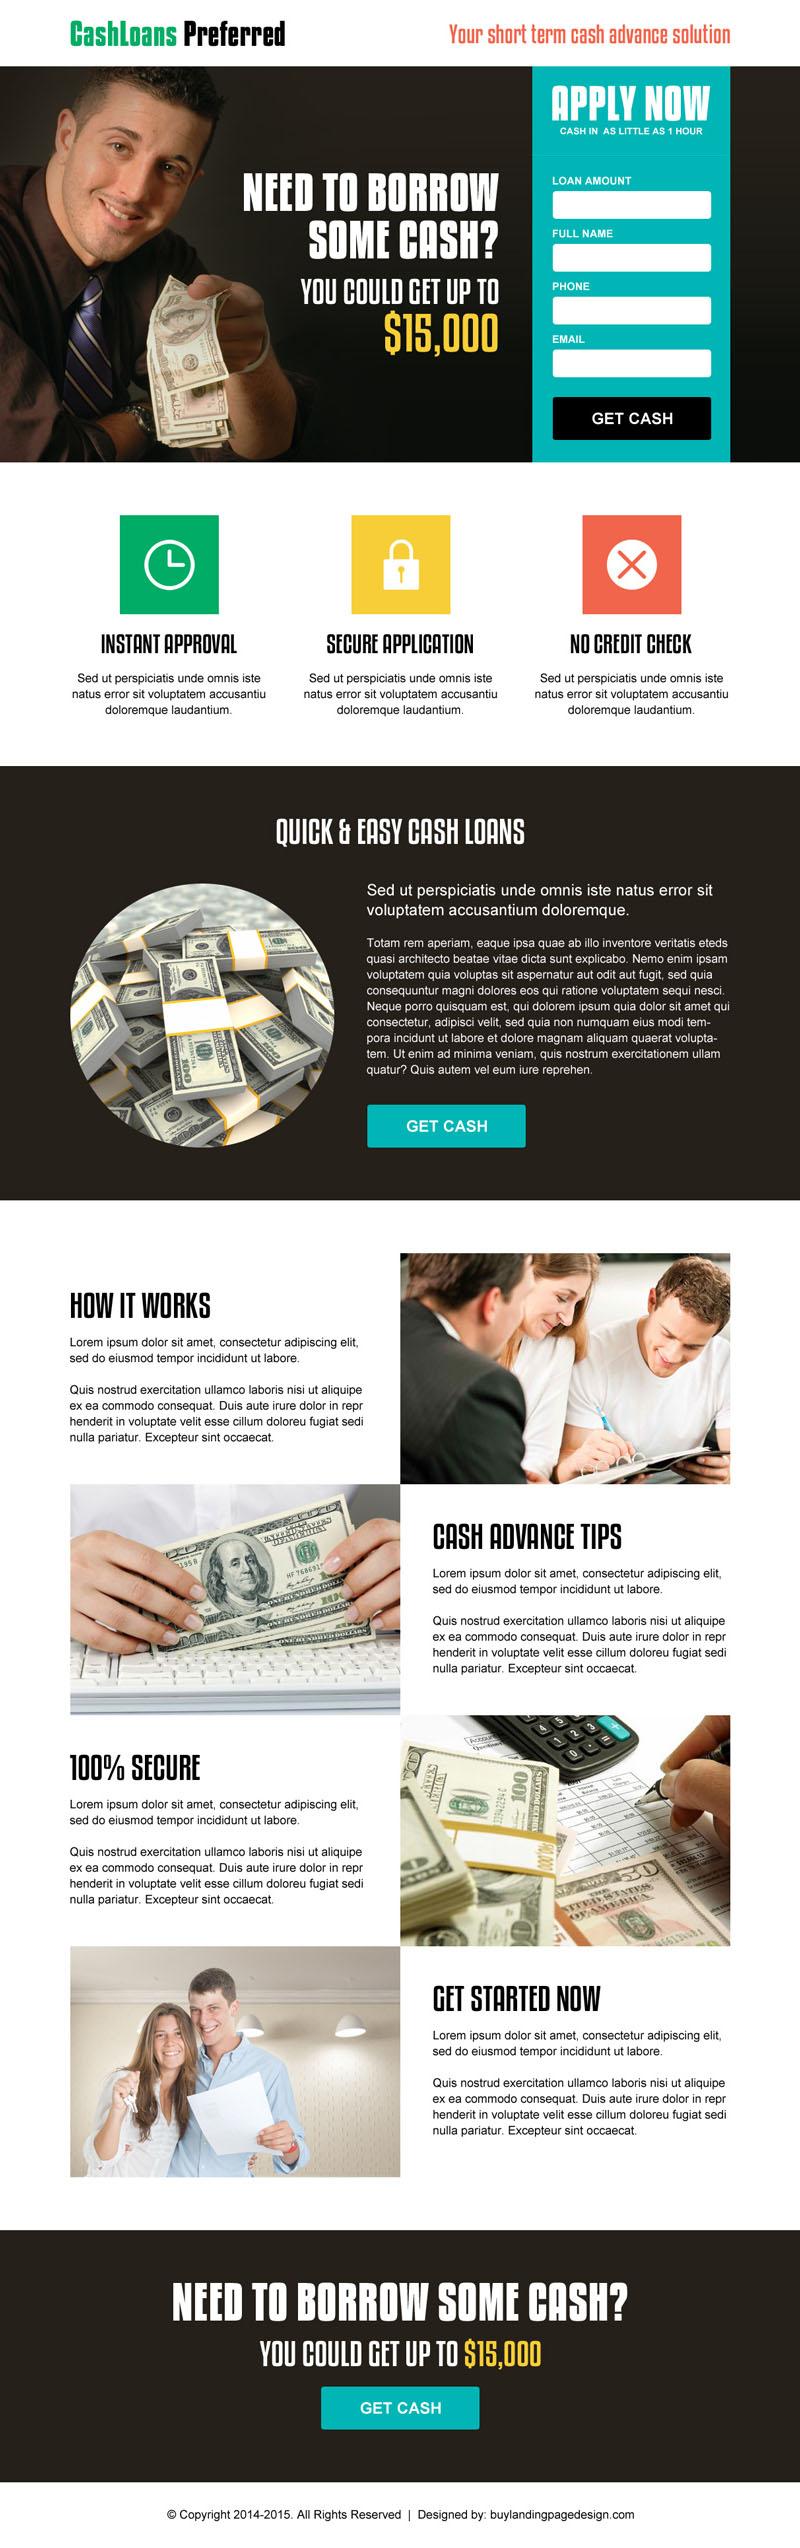 cash-loan-lead-capture-conversion-centered-landing-page-design-template-015